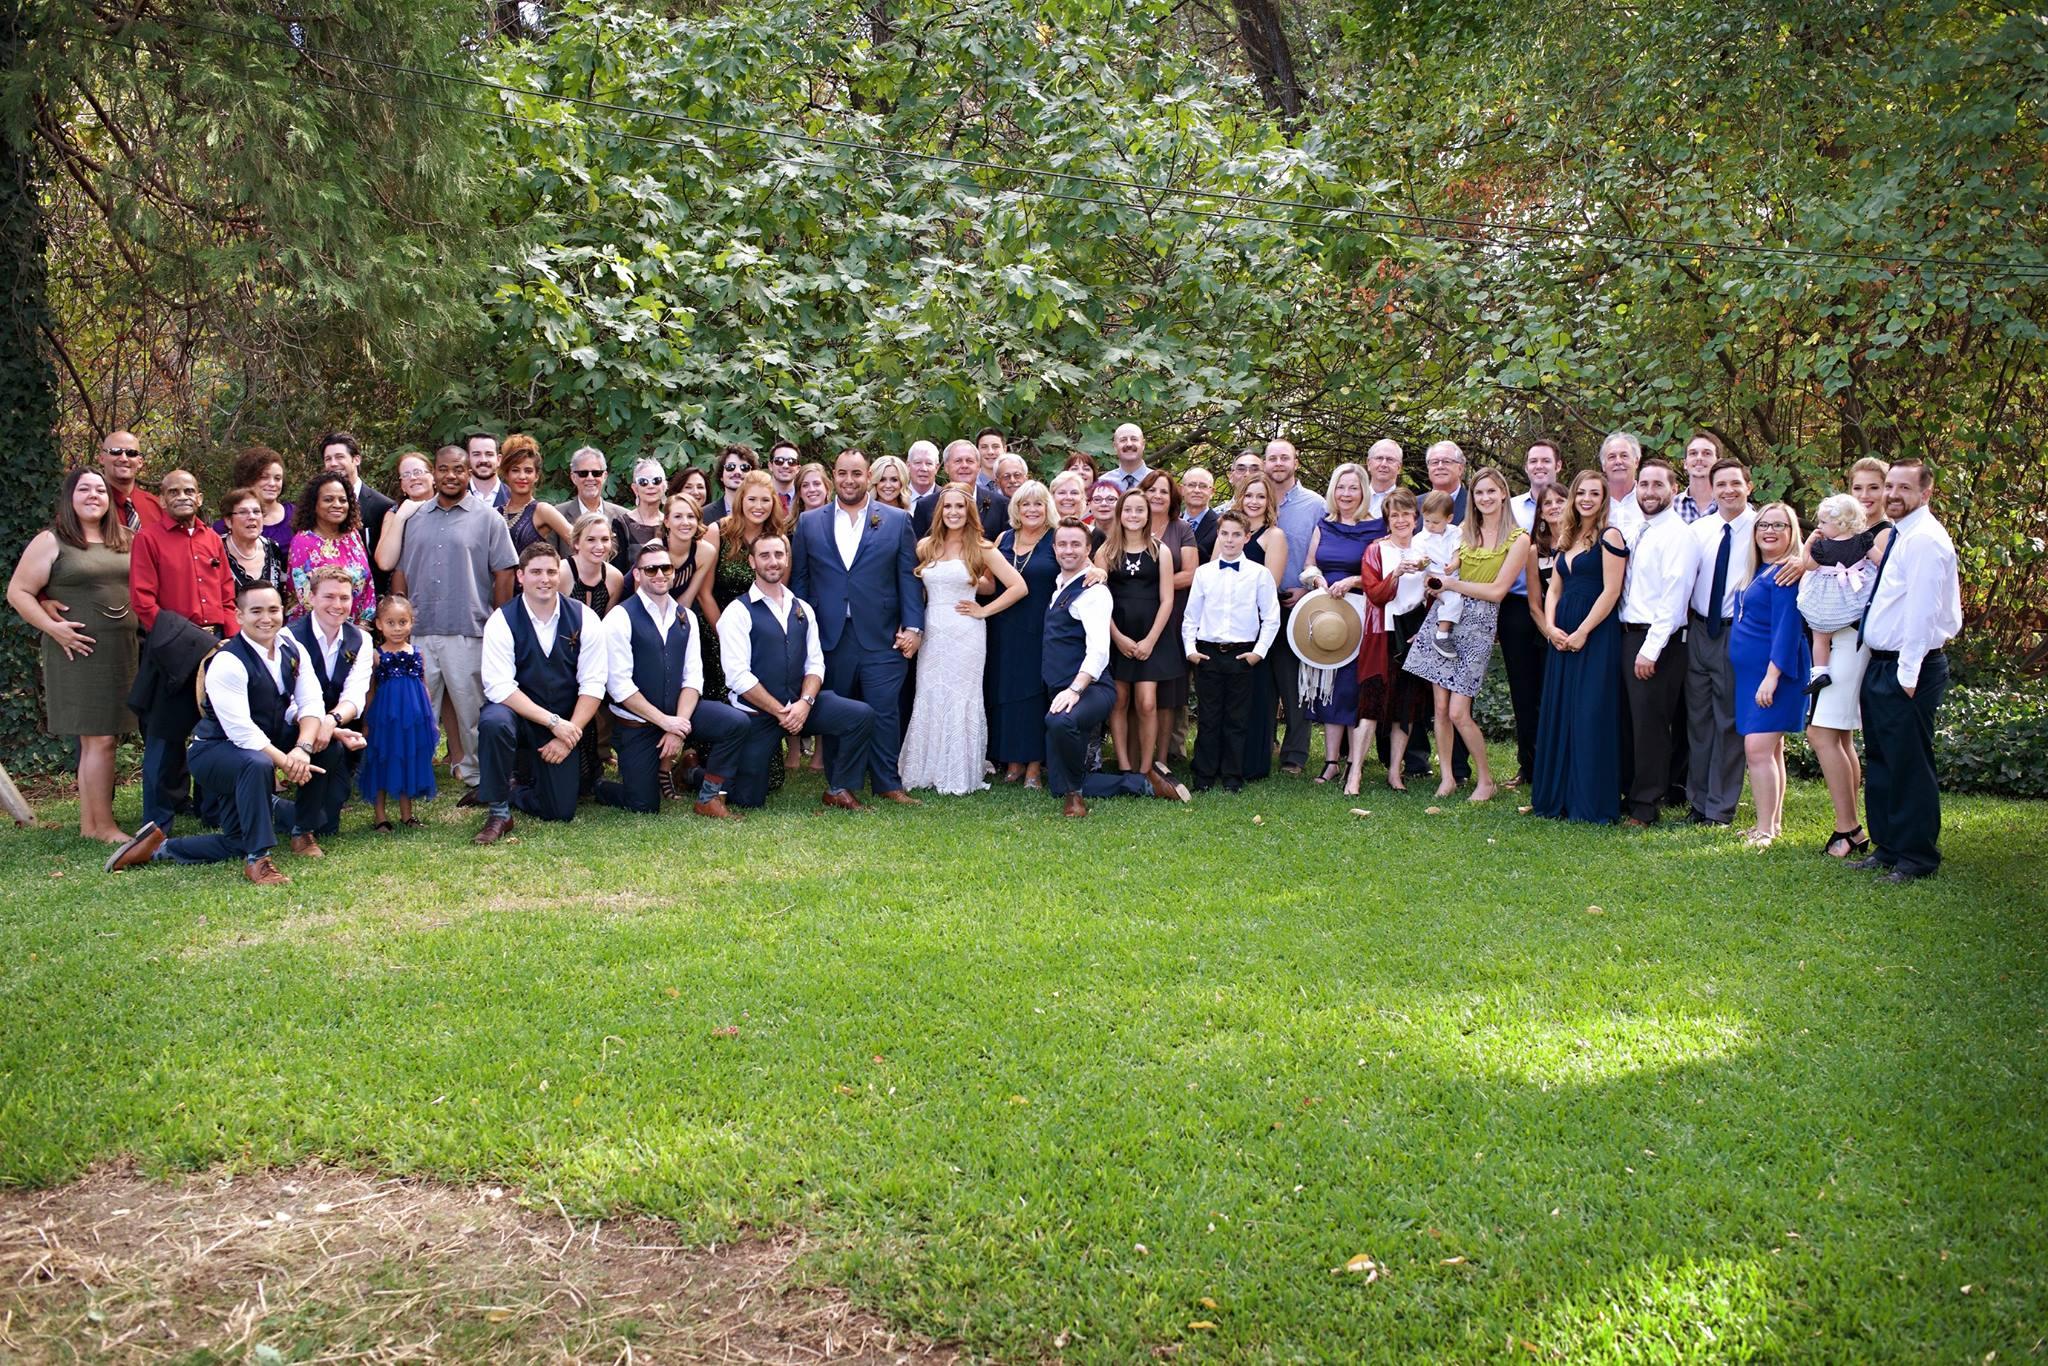 wedding image 34.jpg